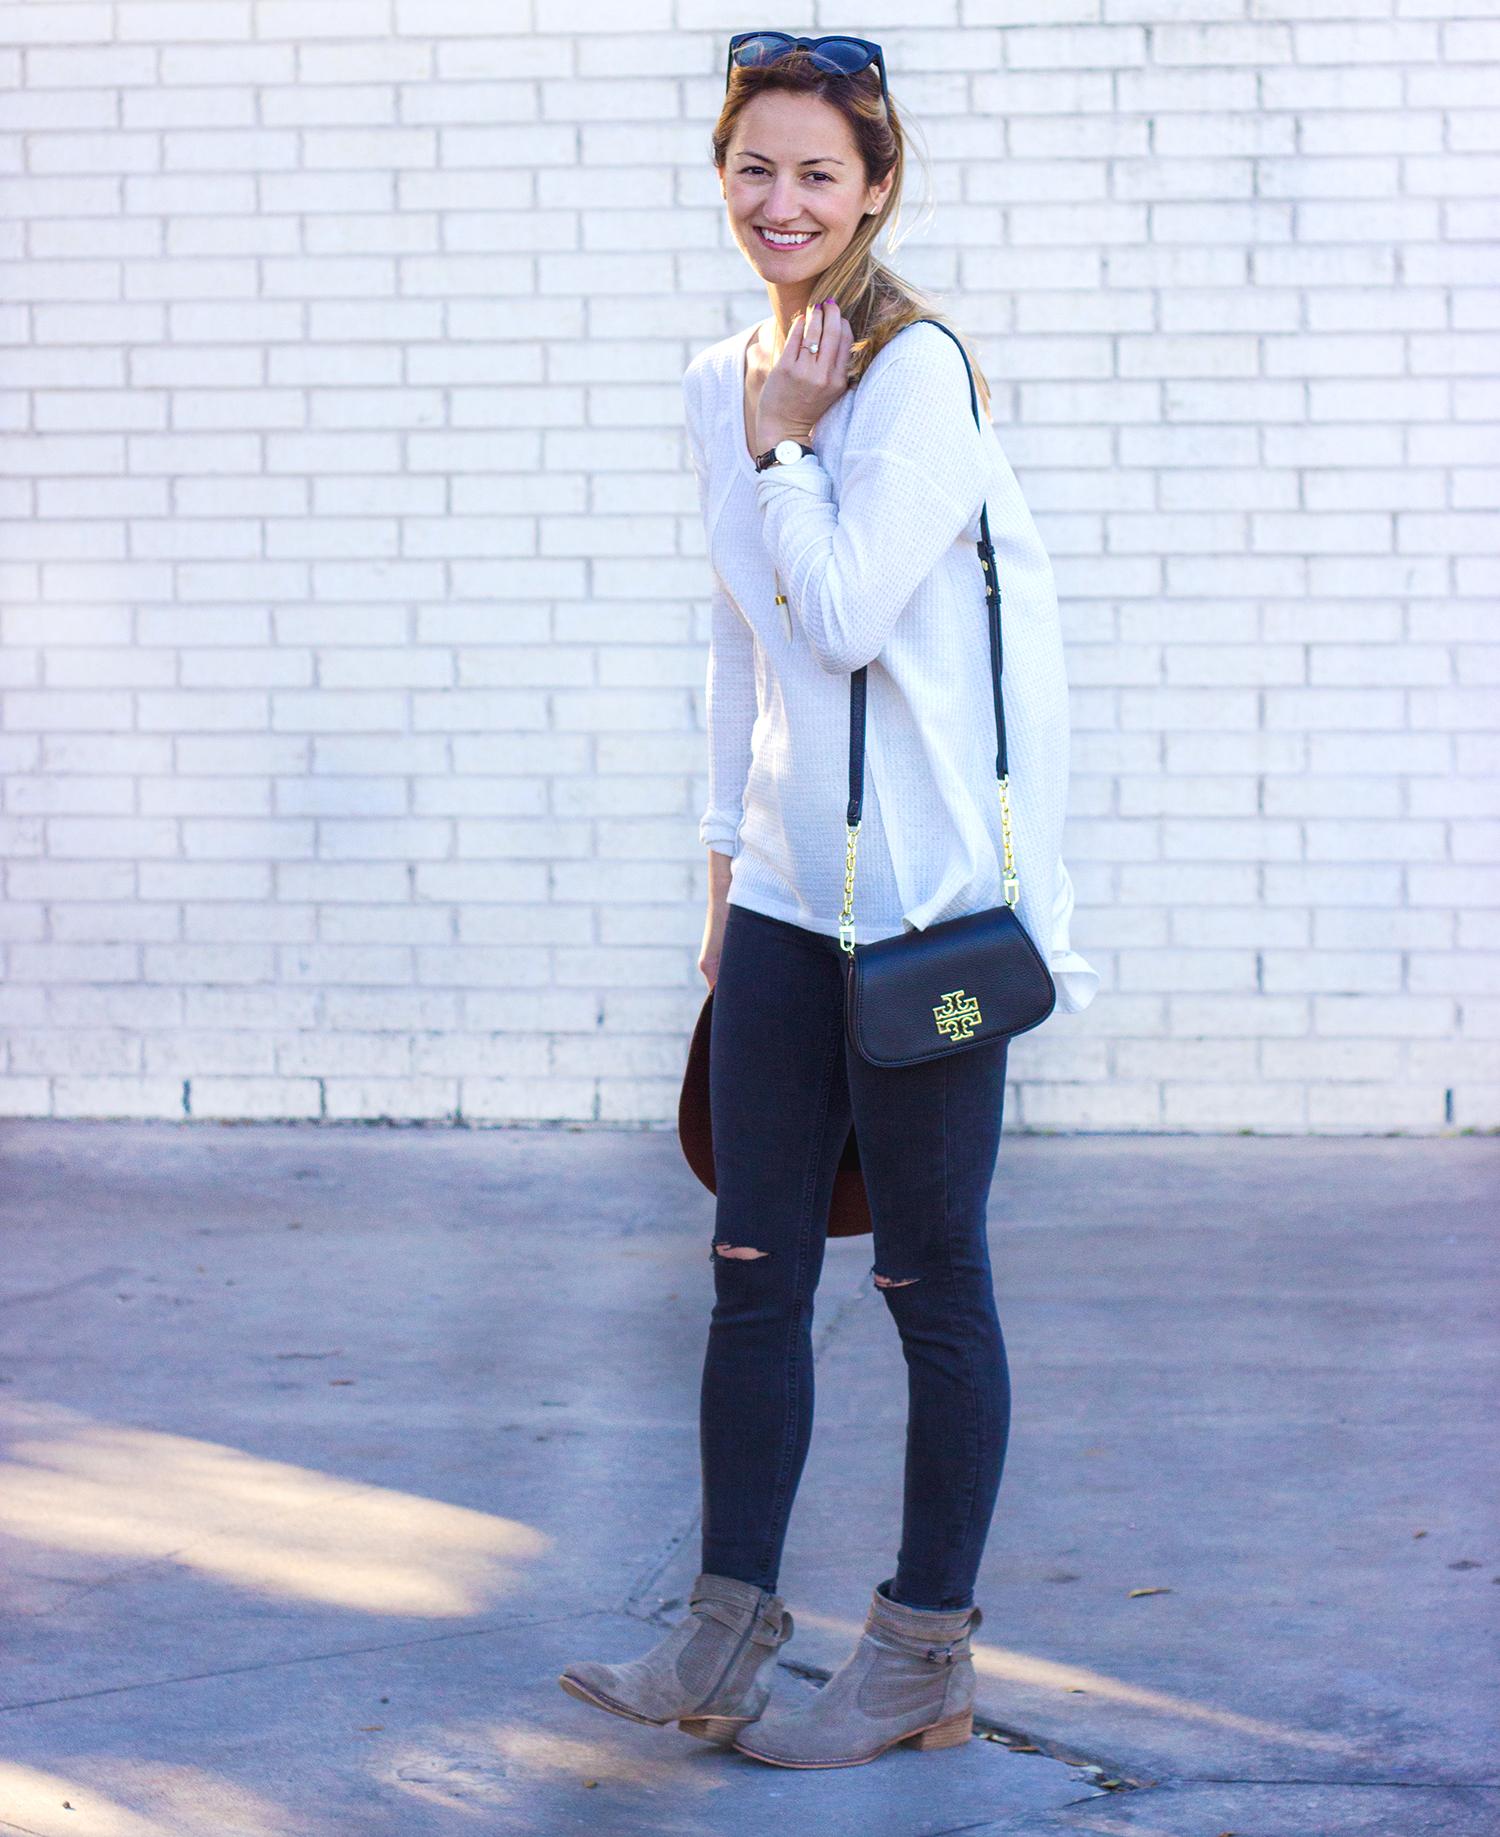 livvyland-blog-olivia-watson-thermal-long-sleeve-cozy-free-people-tee-shirt-topshop-black-distressed-skinny-jeans-austin-texas-fashion-blogger-tory-burch-britten-handbag-black-10